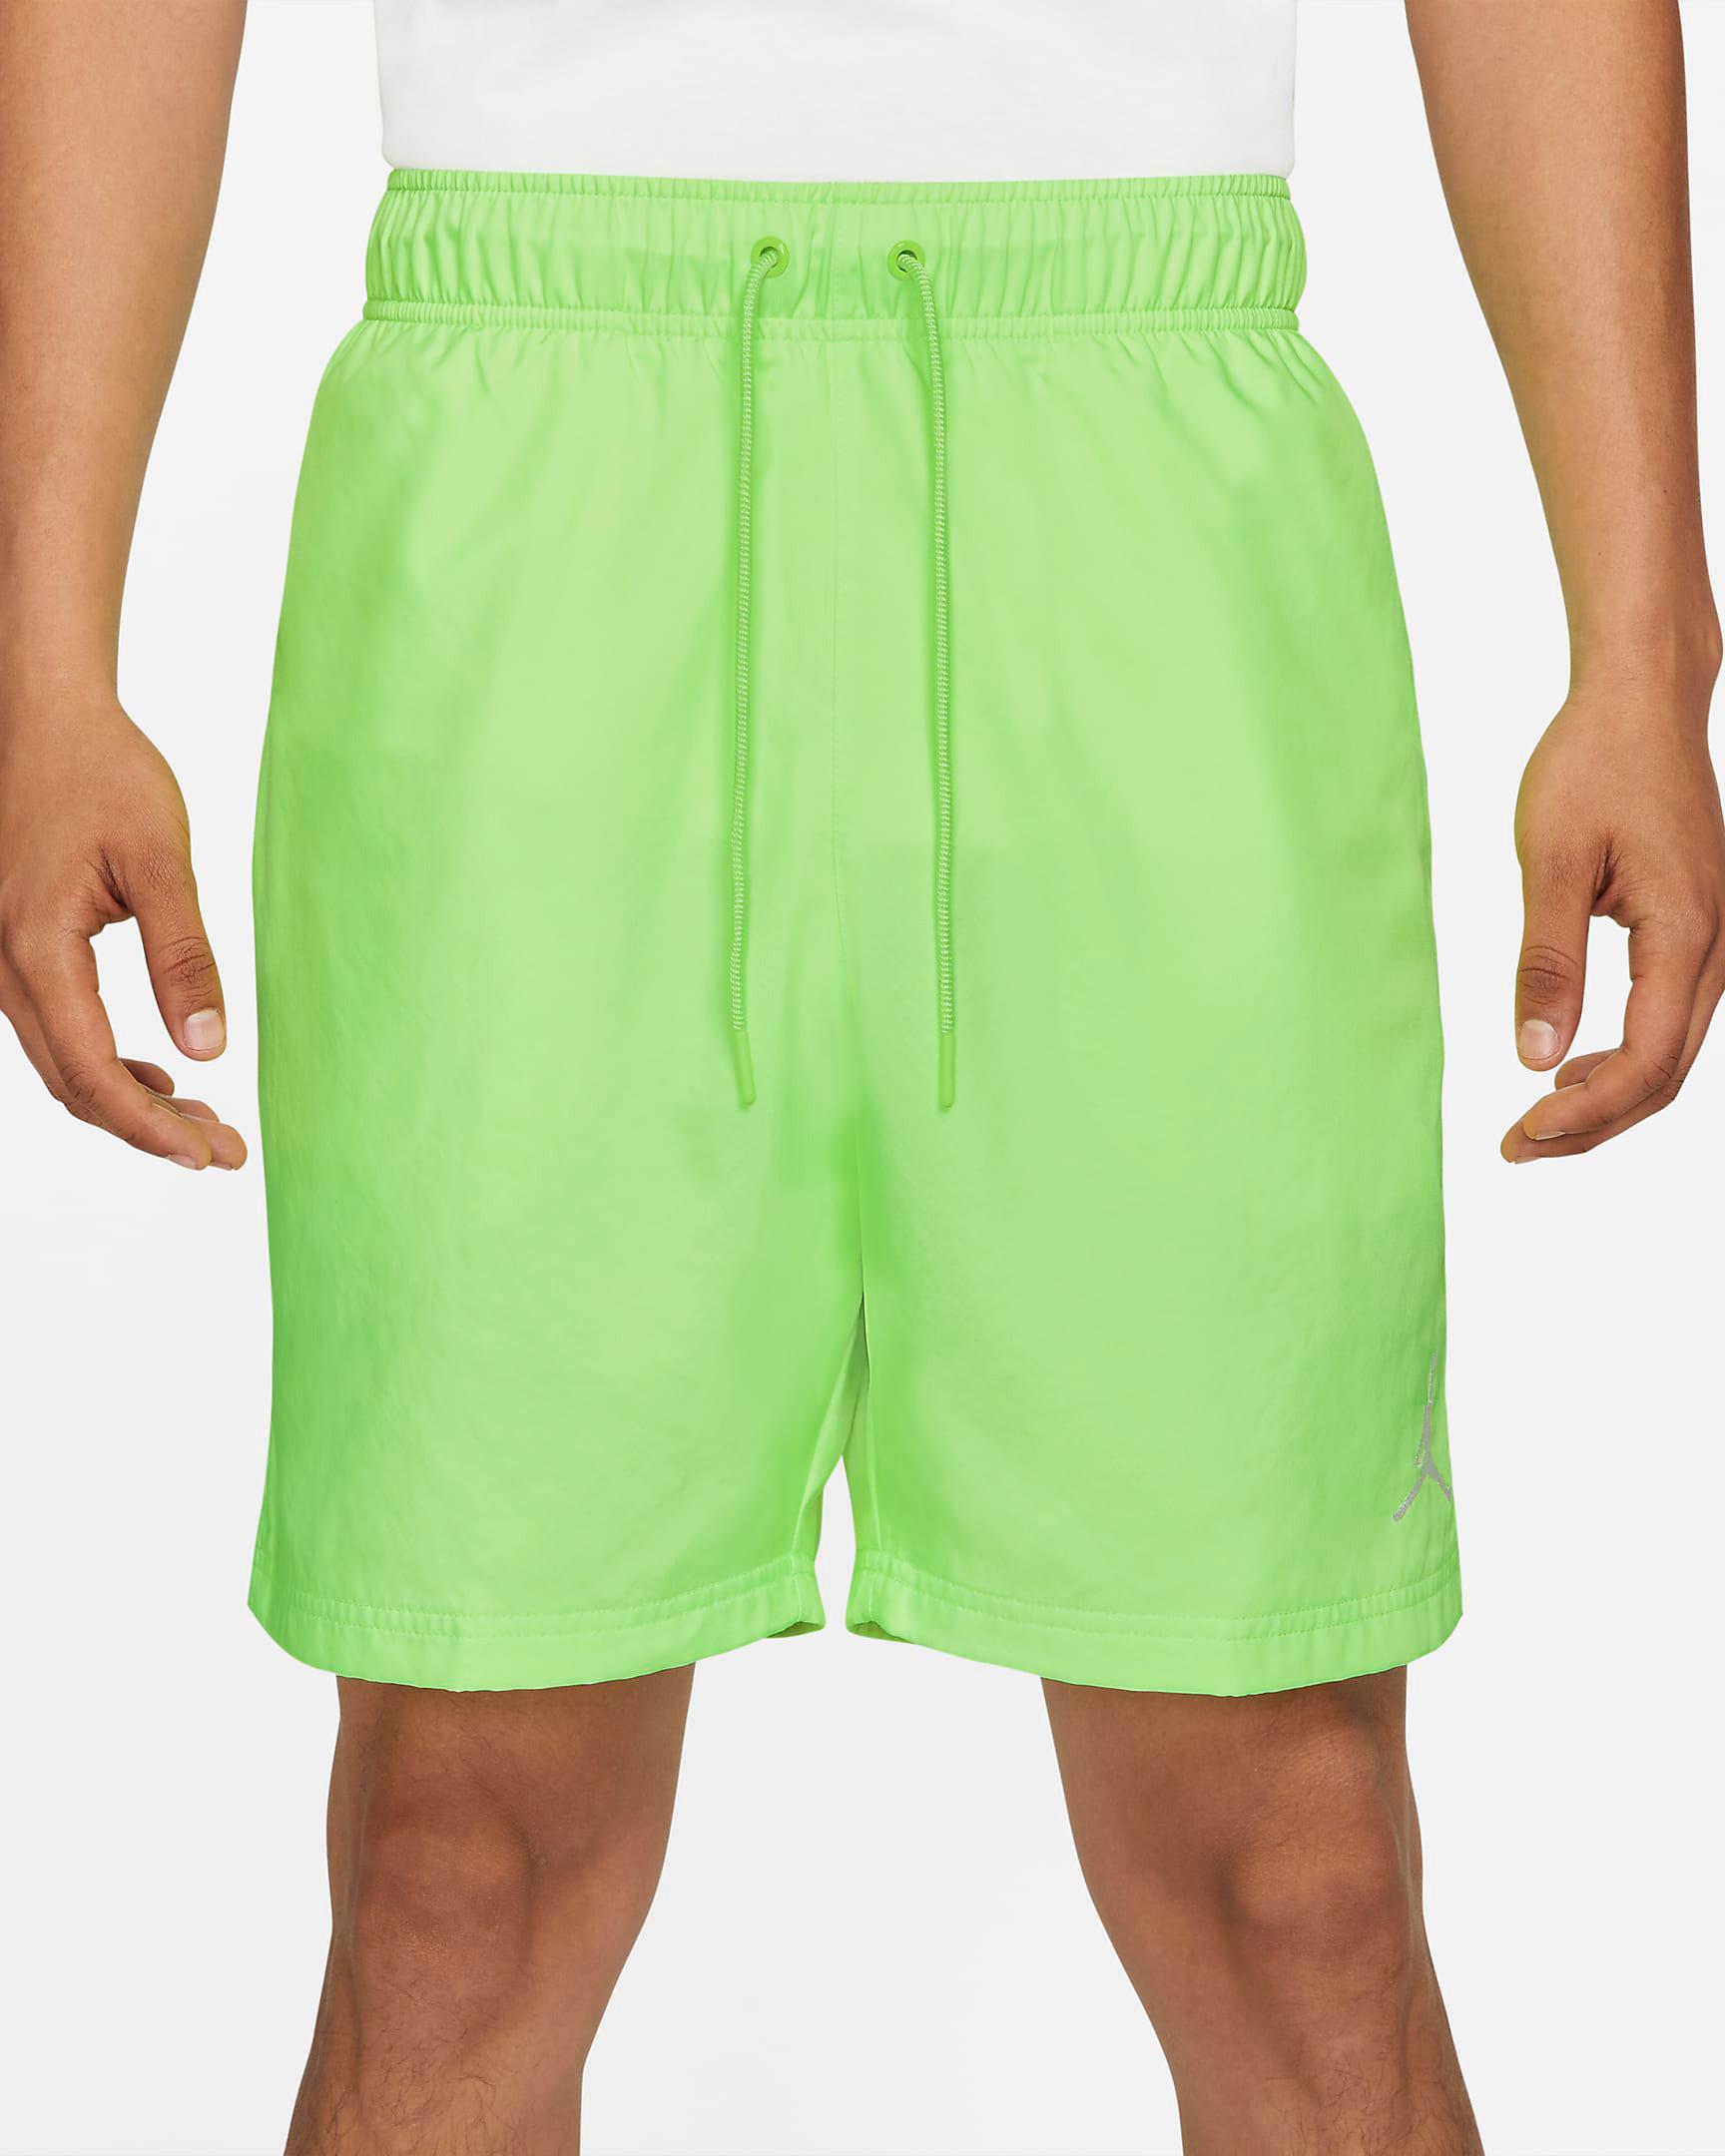 jordan-poolside-shorts-ghost-green